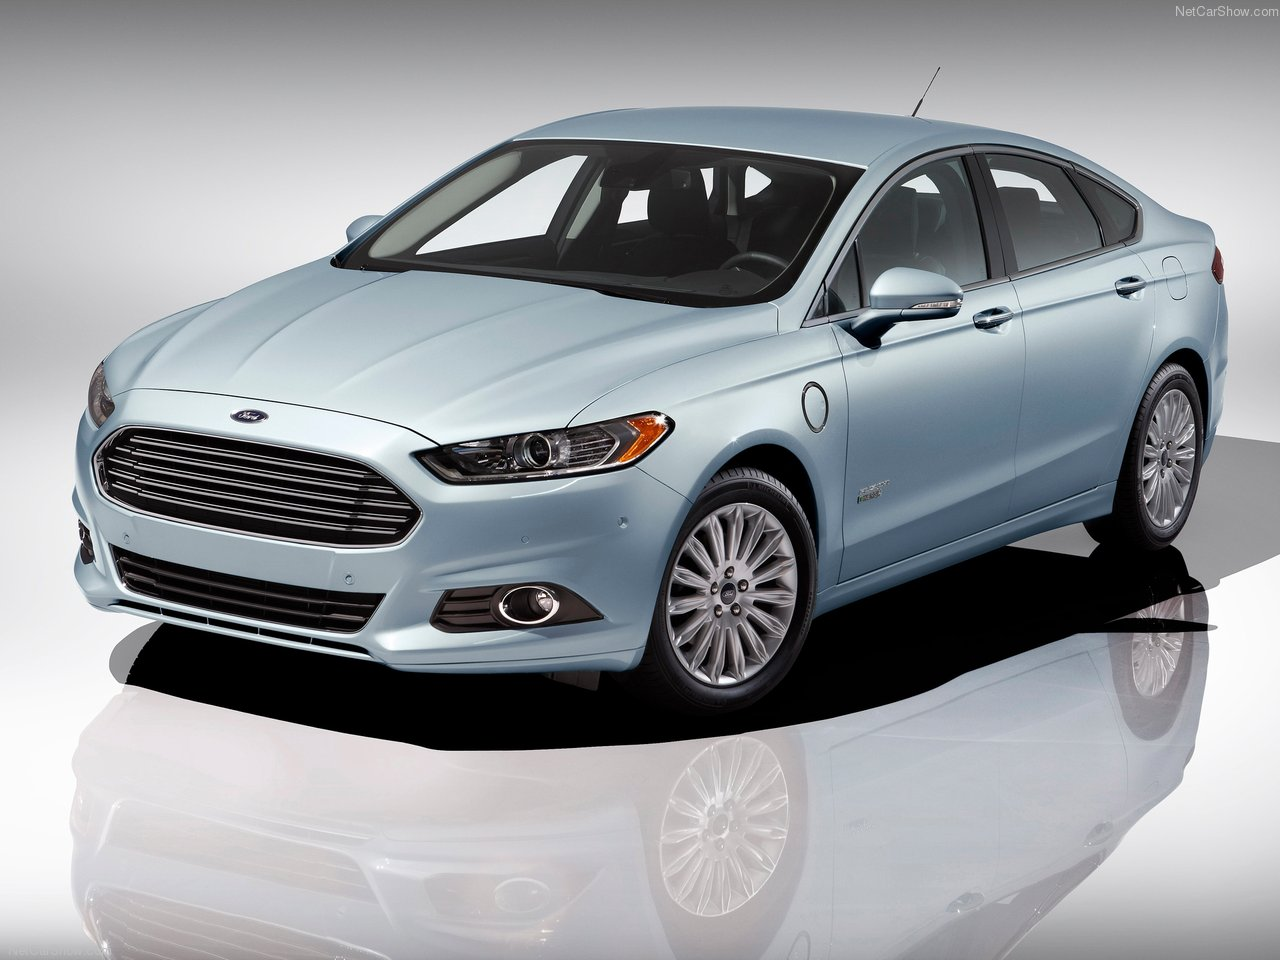 2013 Ford Fusion Energi | Sportier, More Aggressive and Green 12